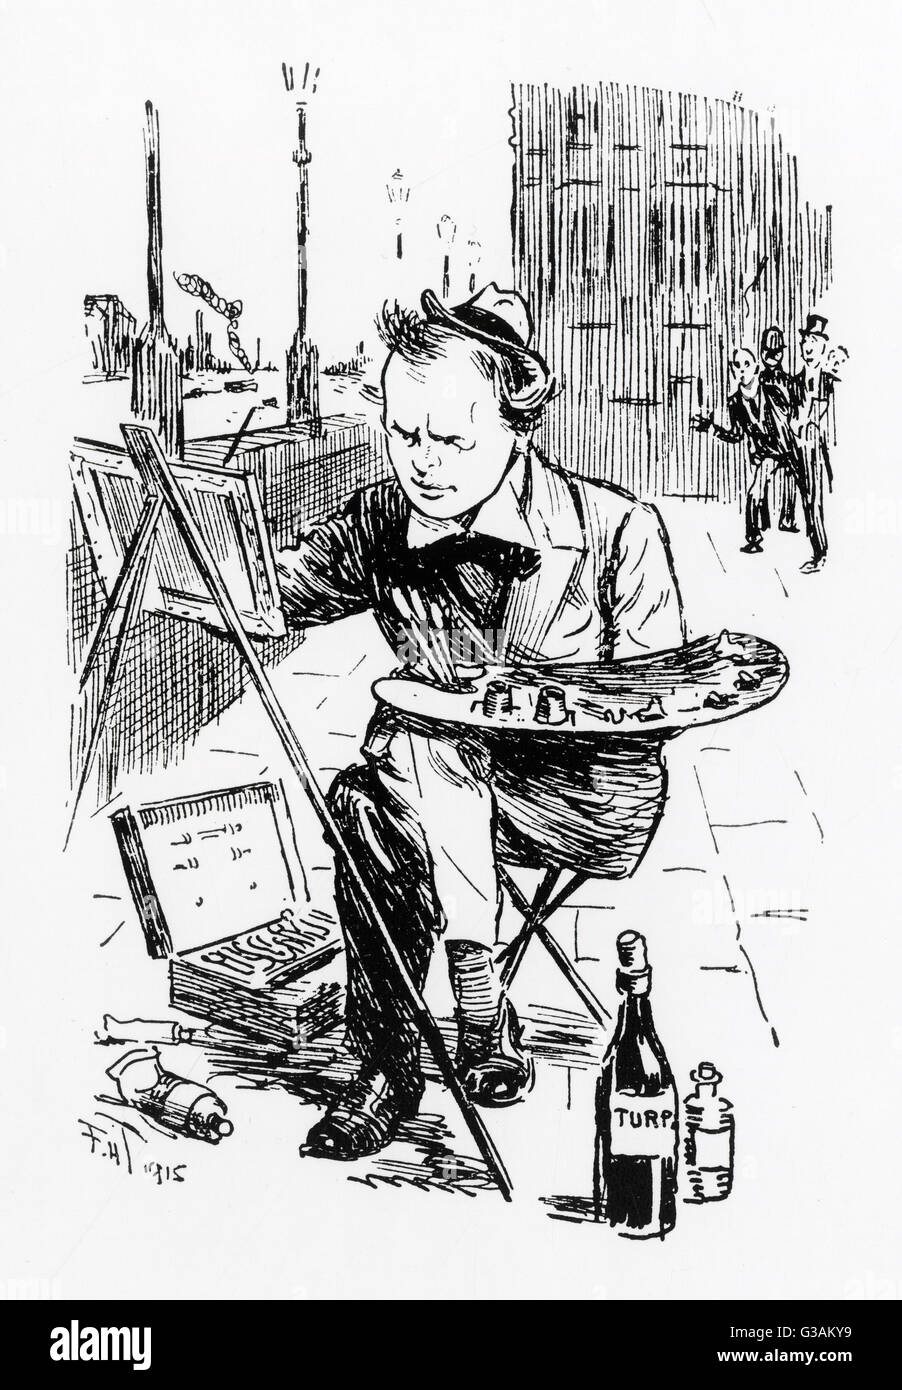 Winston Churchill - Punch Cartoon     Date: 1915 - Stock Image